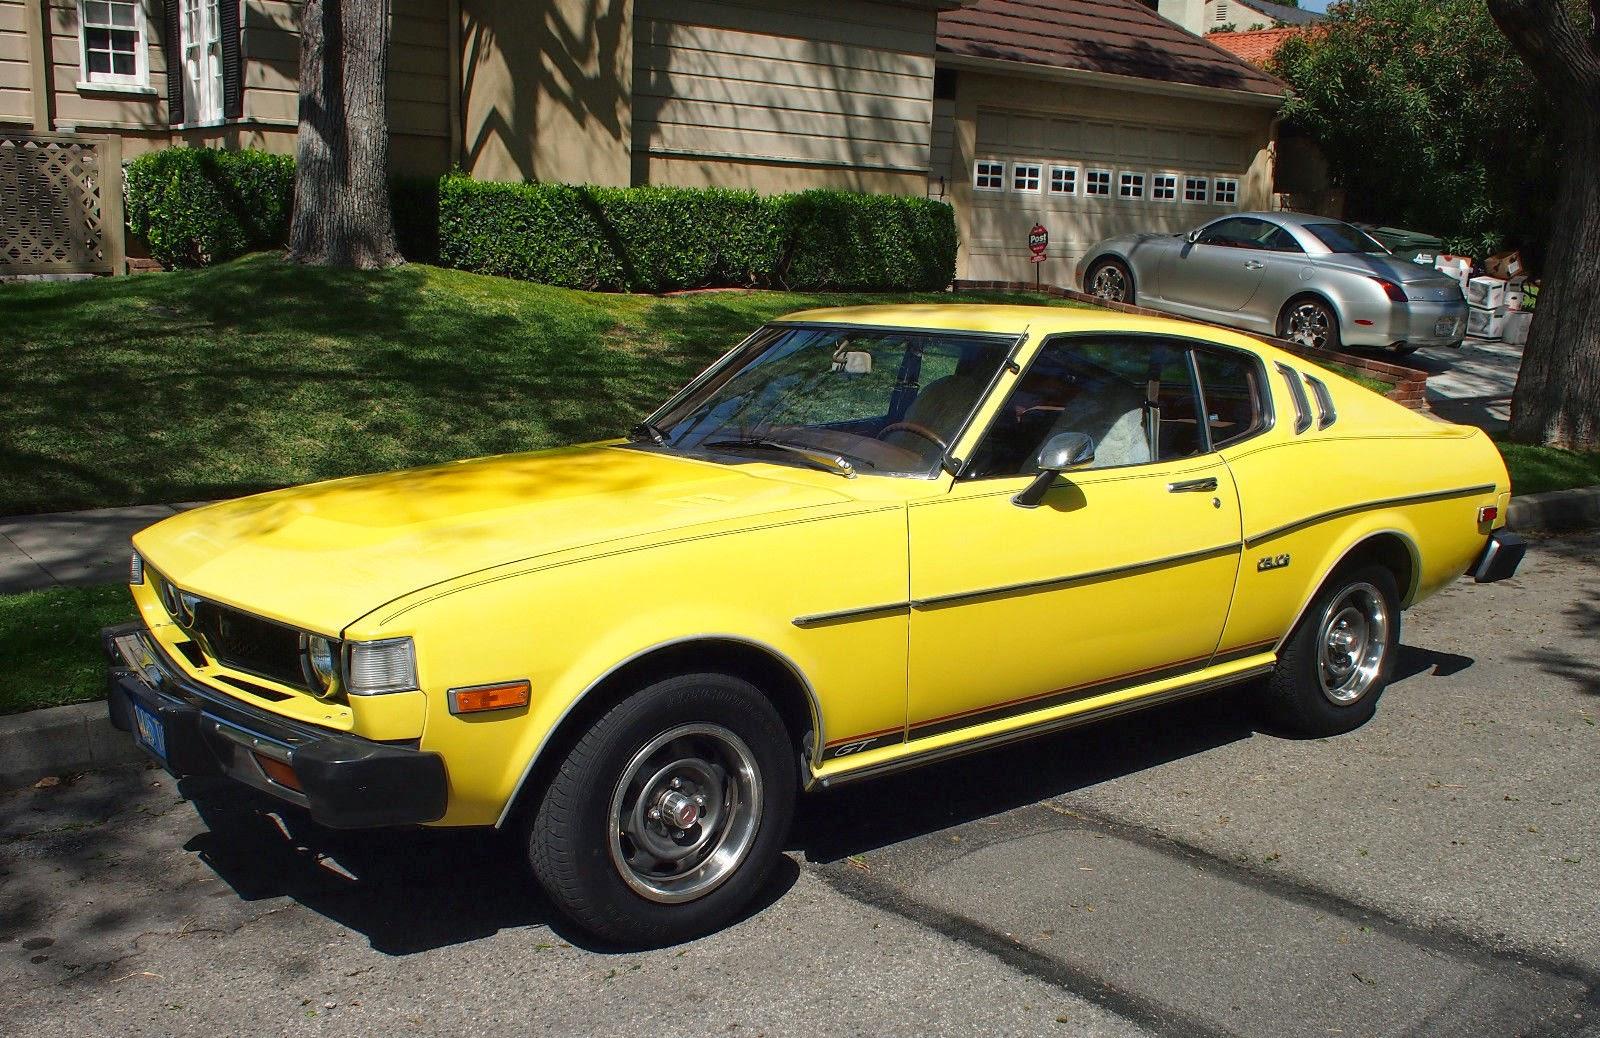 1977 Toyota Celica For Sale: Daily Turismo: 5k: Yellow Bird: 1977 Toyota Celica GT Liftback